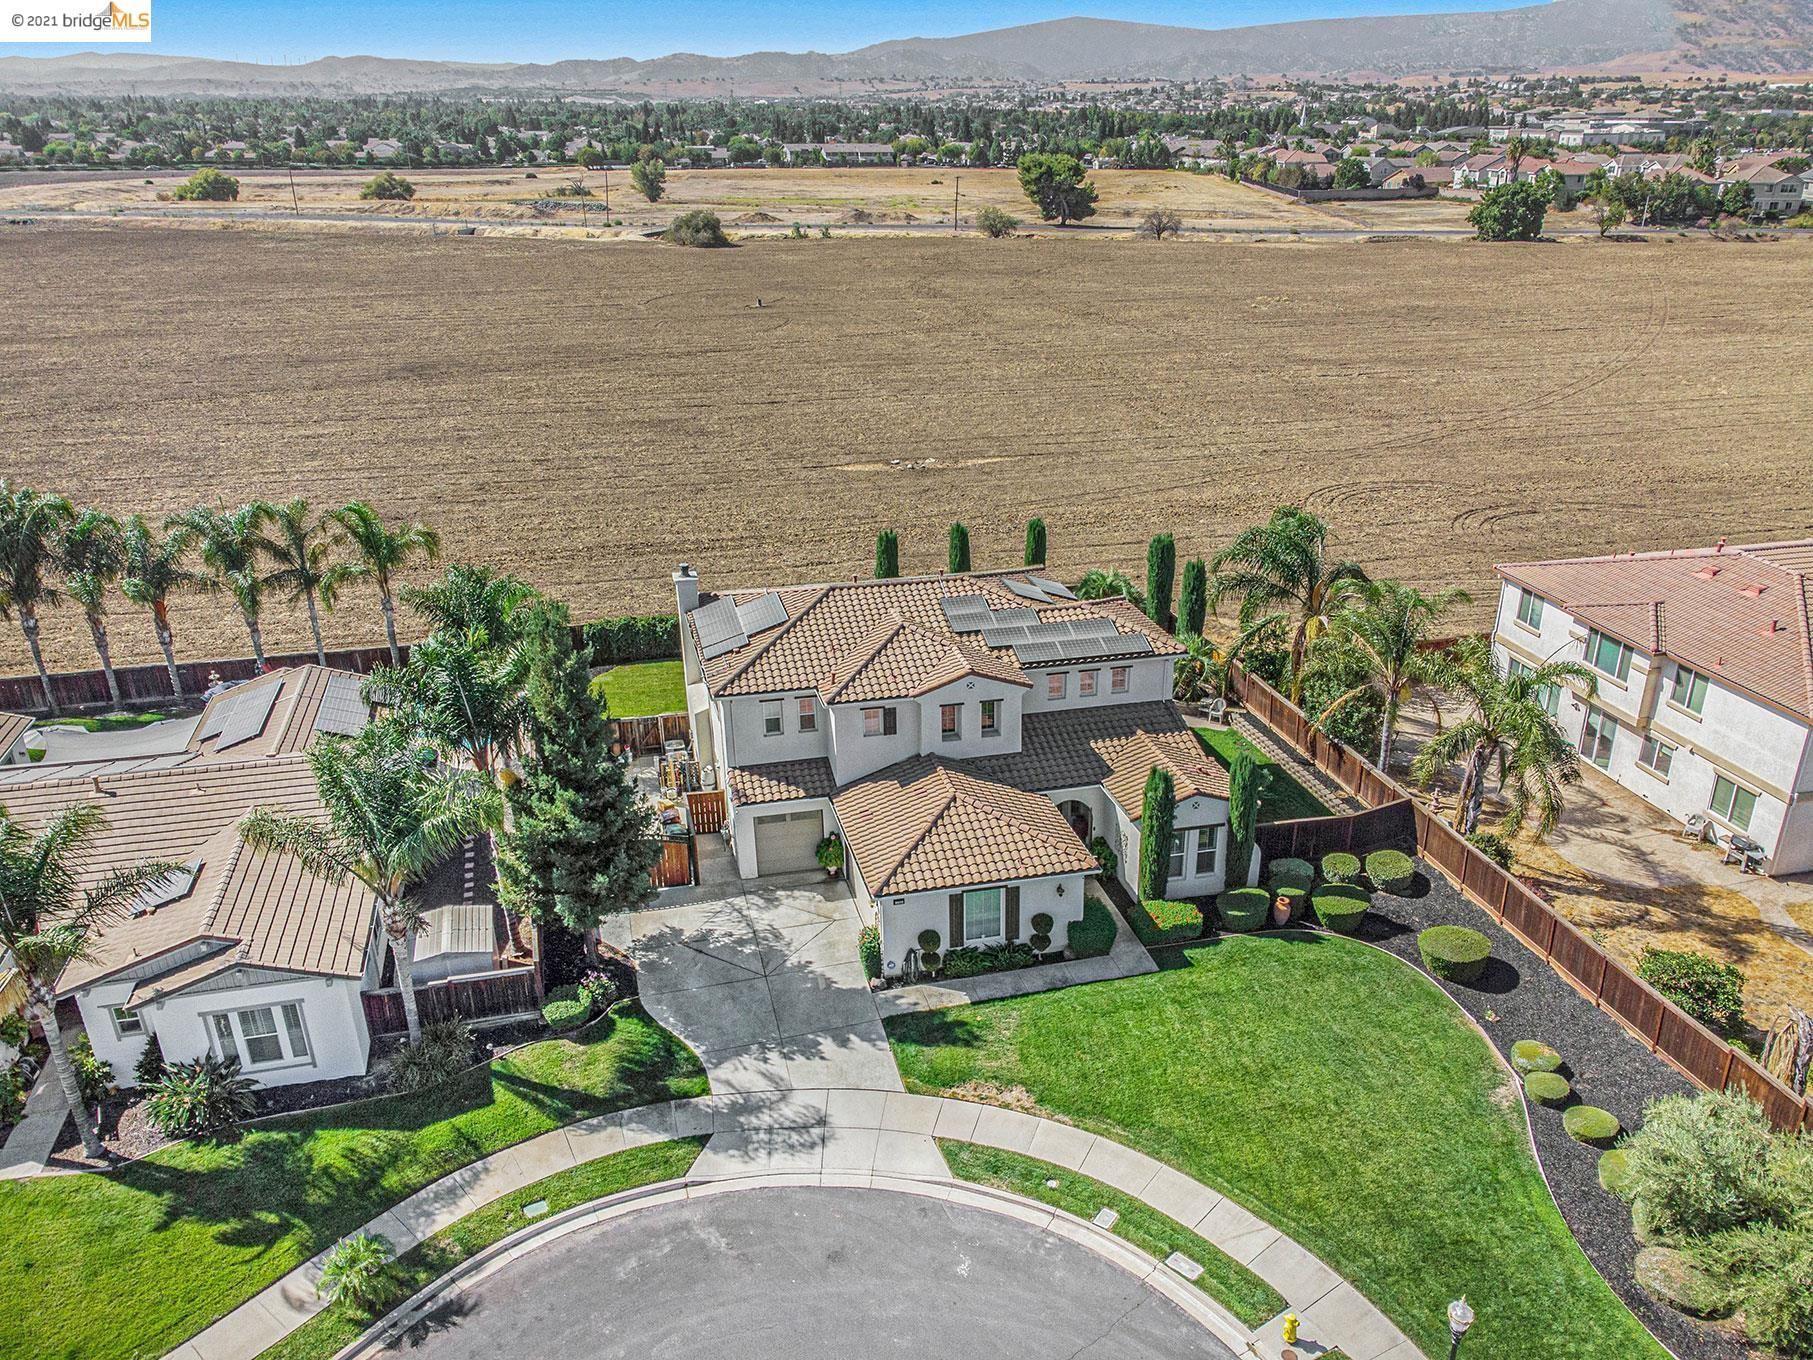 Photo of 1732 Brampton Pl, BRENTWOOD, CA 94513 (MLS # 40967134)